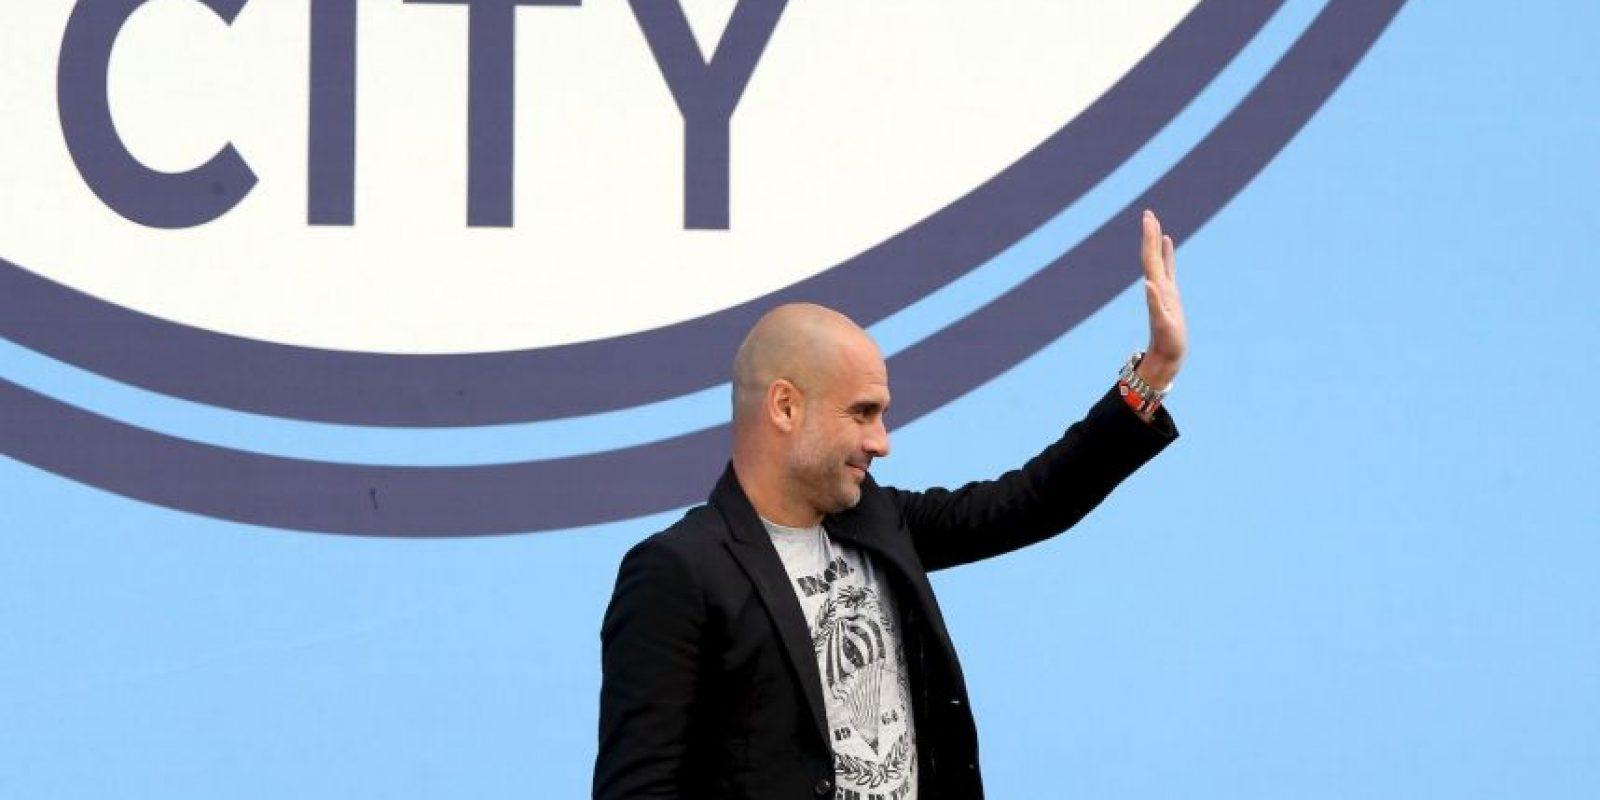 Pep Guardiola causa sensación como nuevo técnico de Manchester City Foto:Getty Images